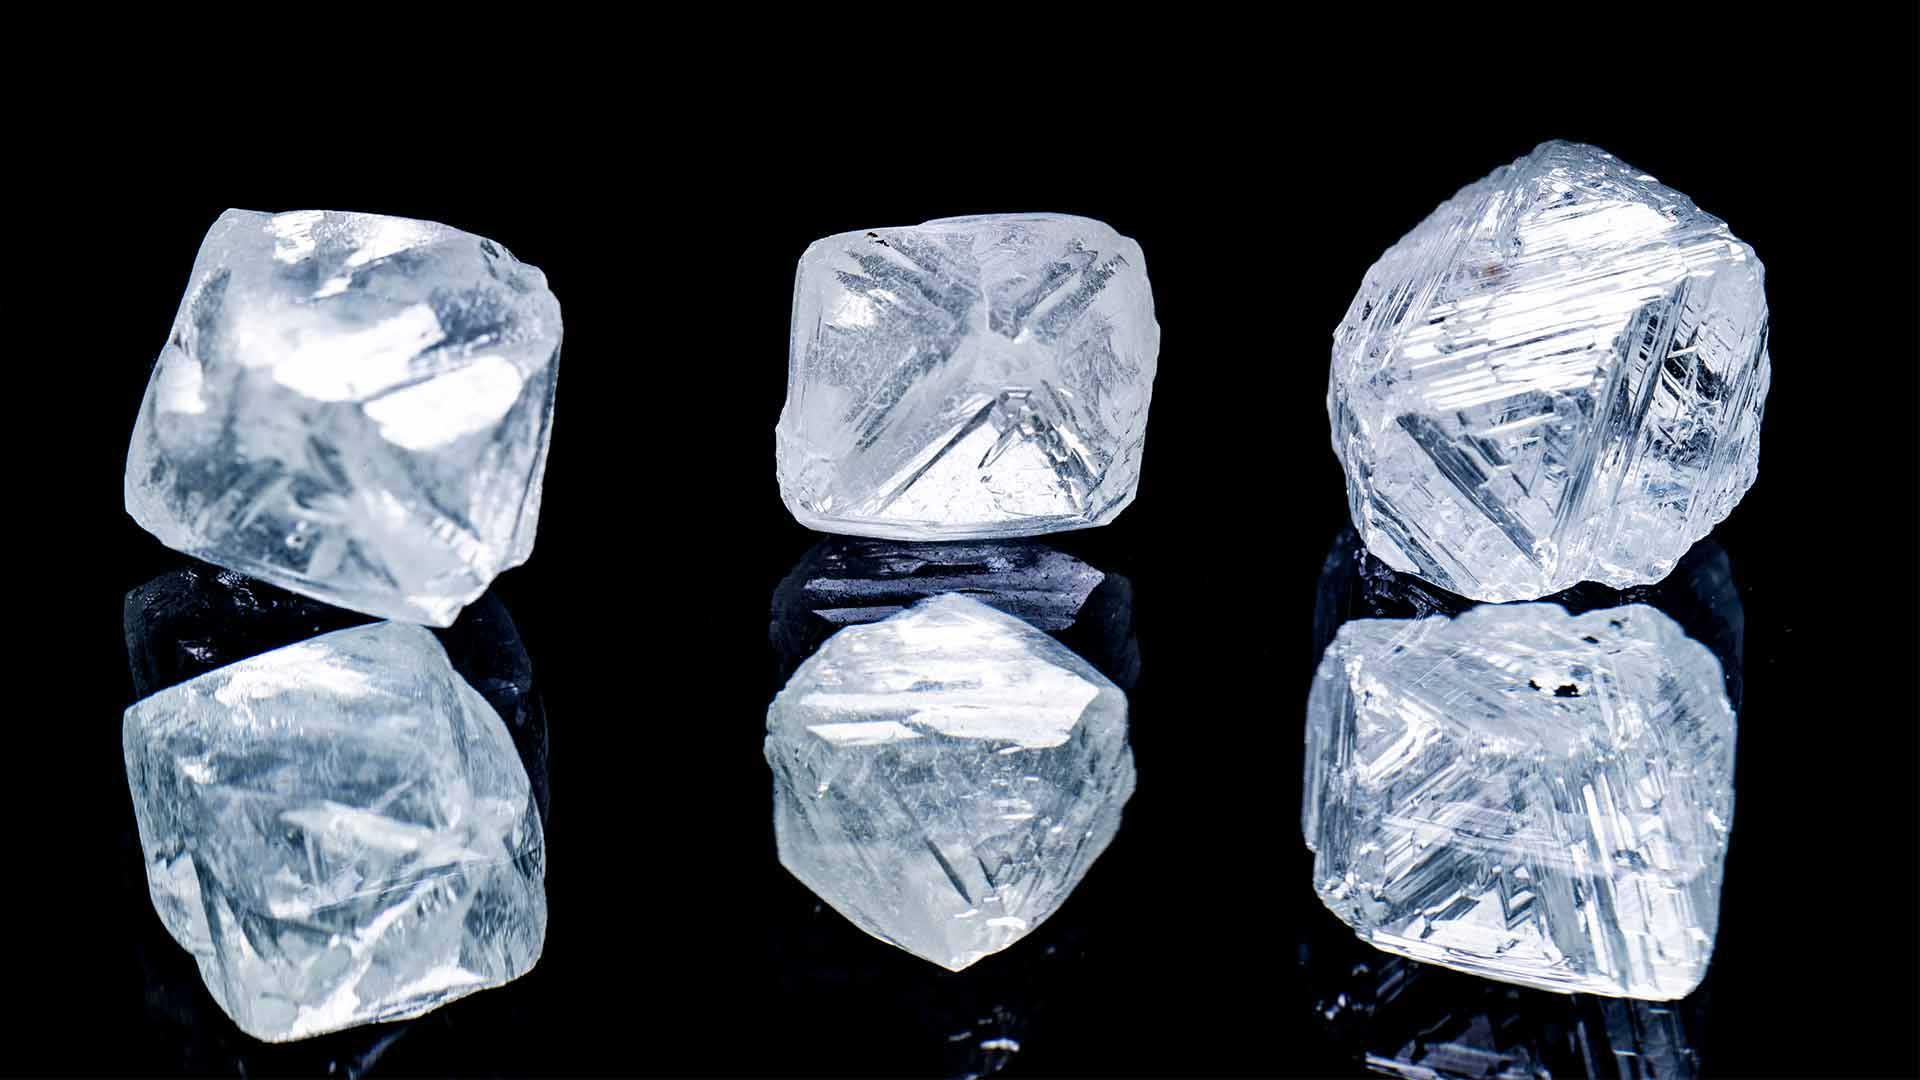 Evolution of the price of diamonds